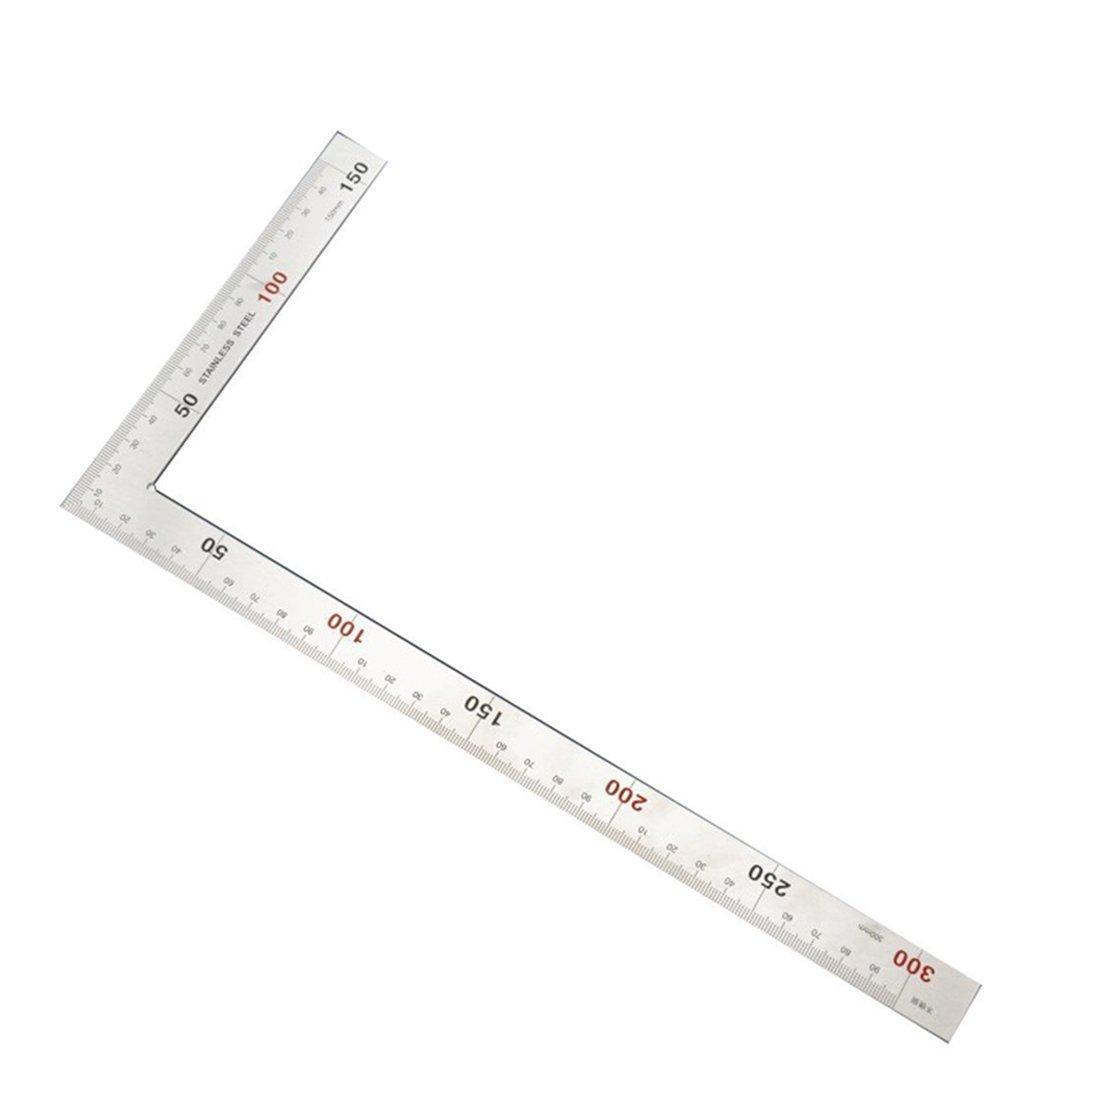 TOOGOO 400mm 2 in1 Digital Angle Finder Meter Protractor Goniometer Ruler 360 Degree Measurer